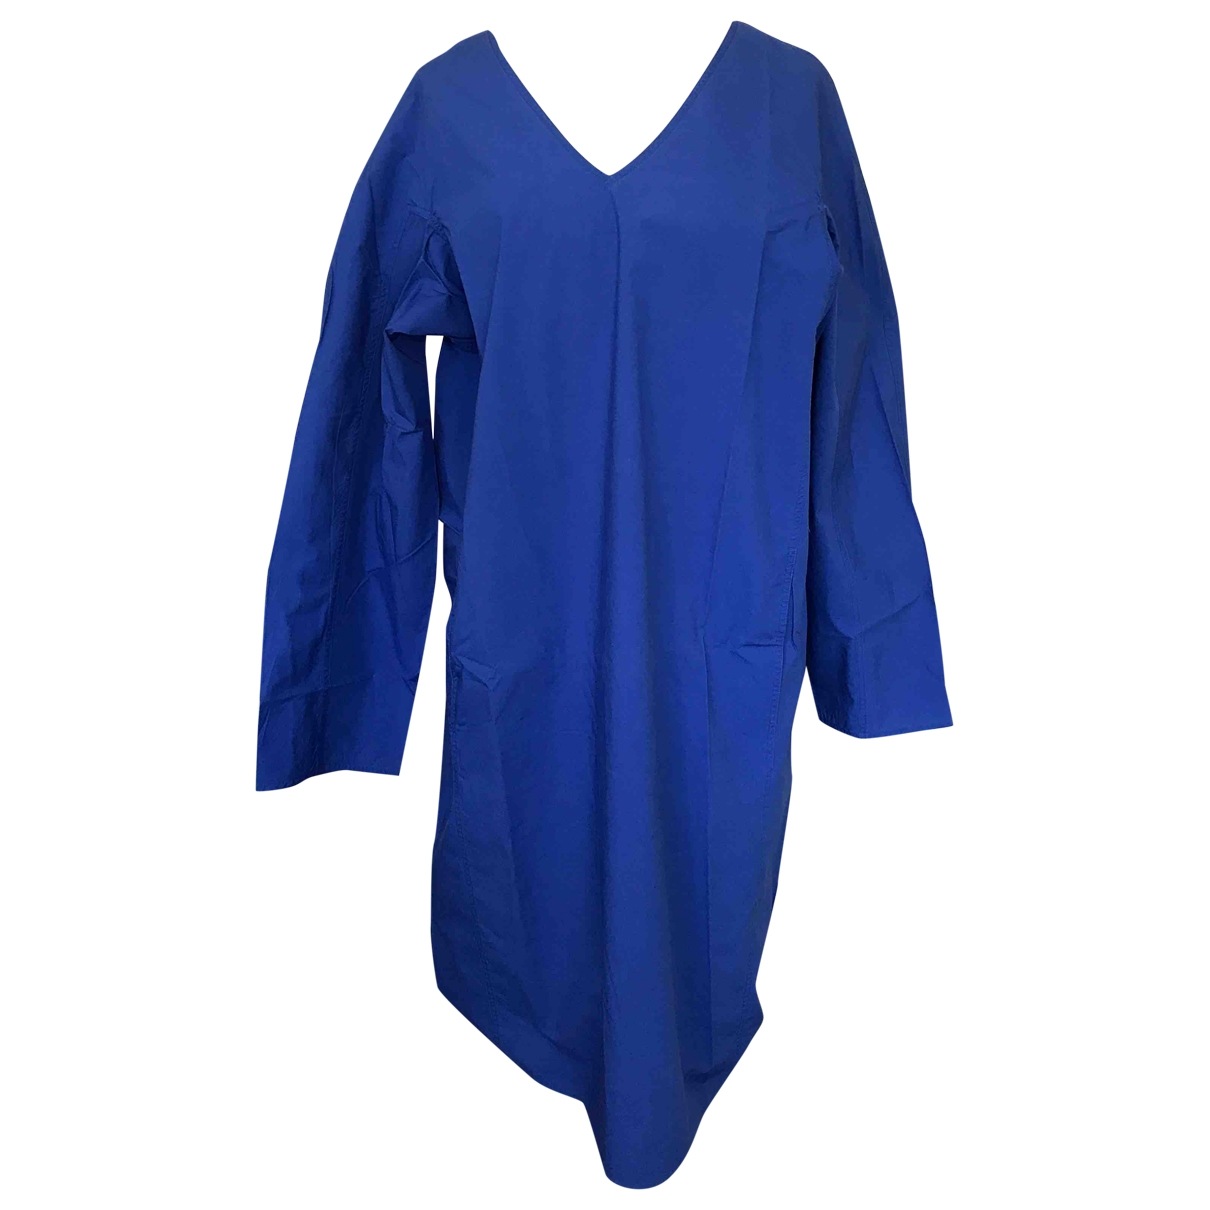 Sofie Dhoore \N Blue Cotton dress for Women 36 FR